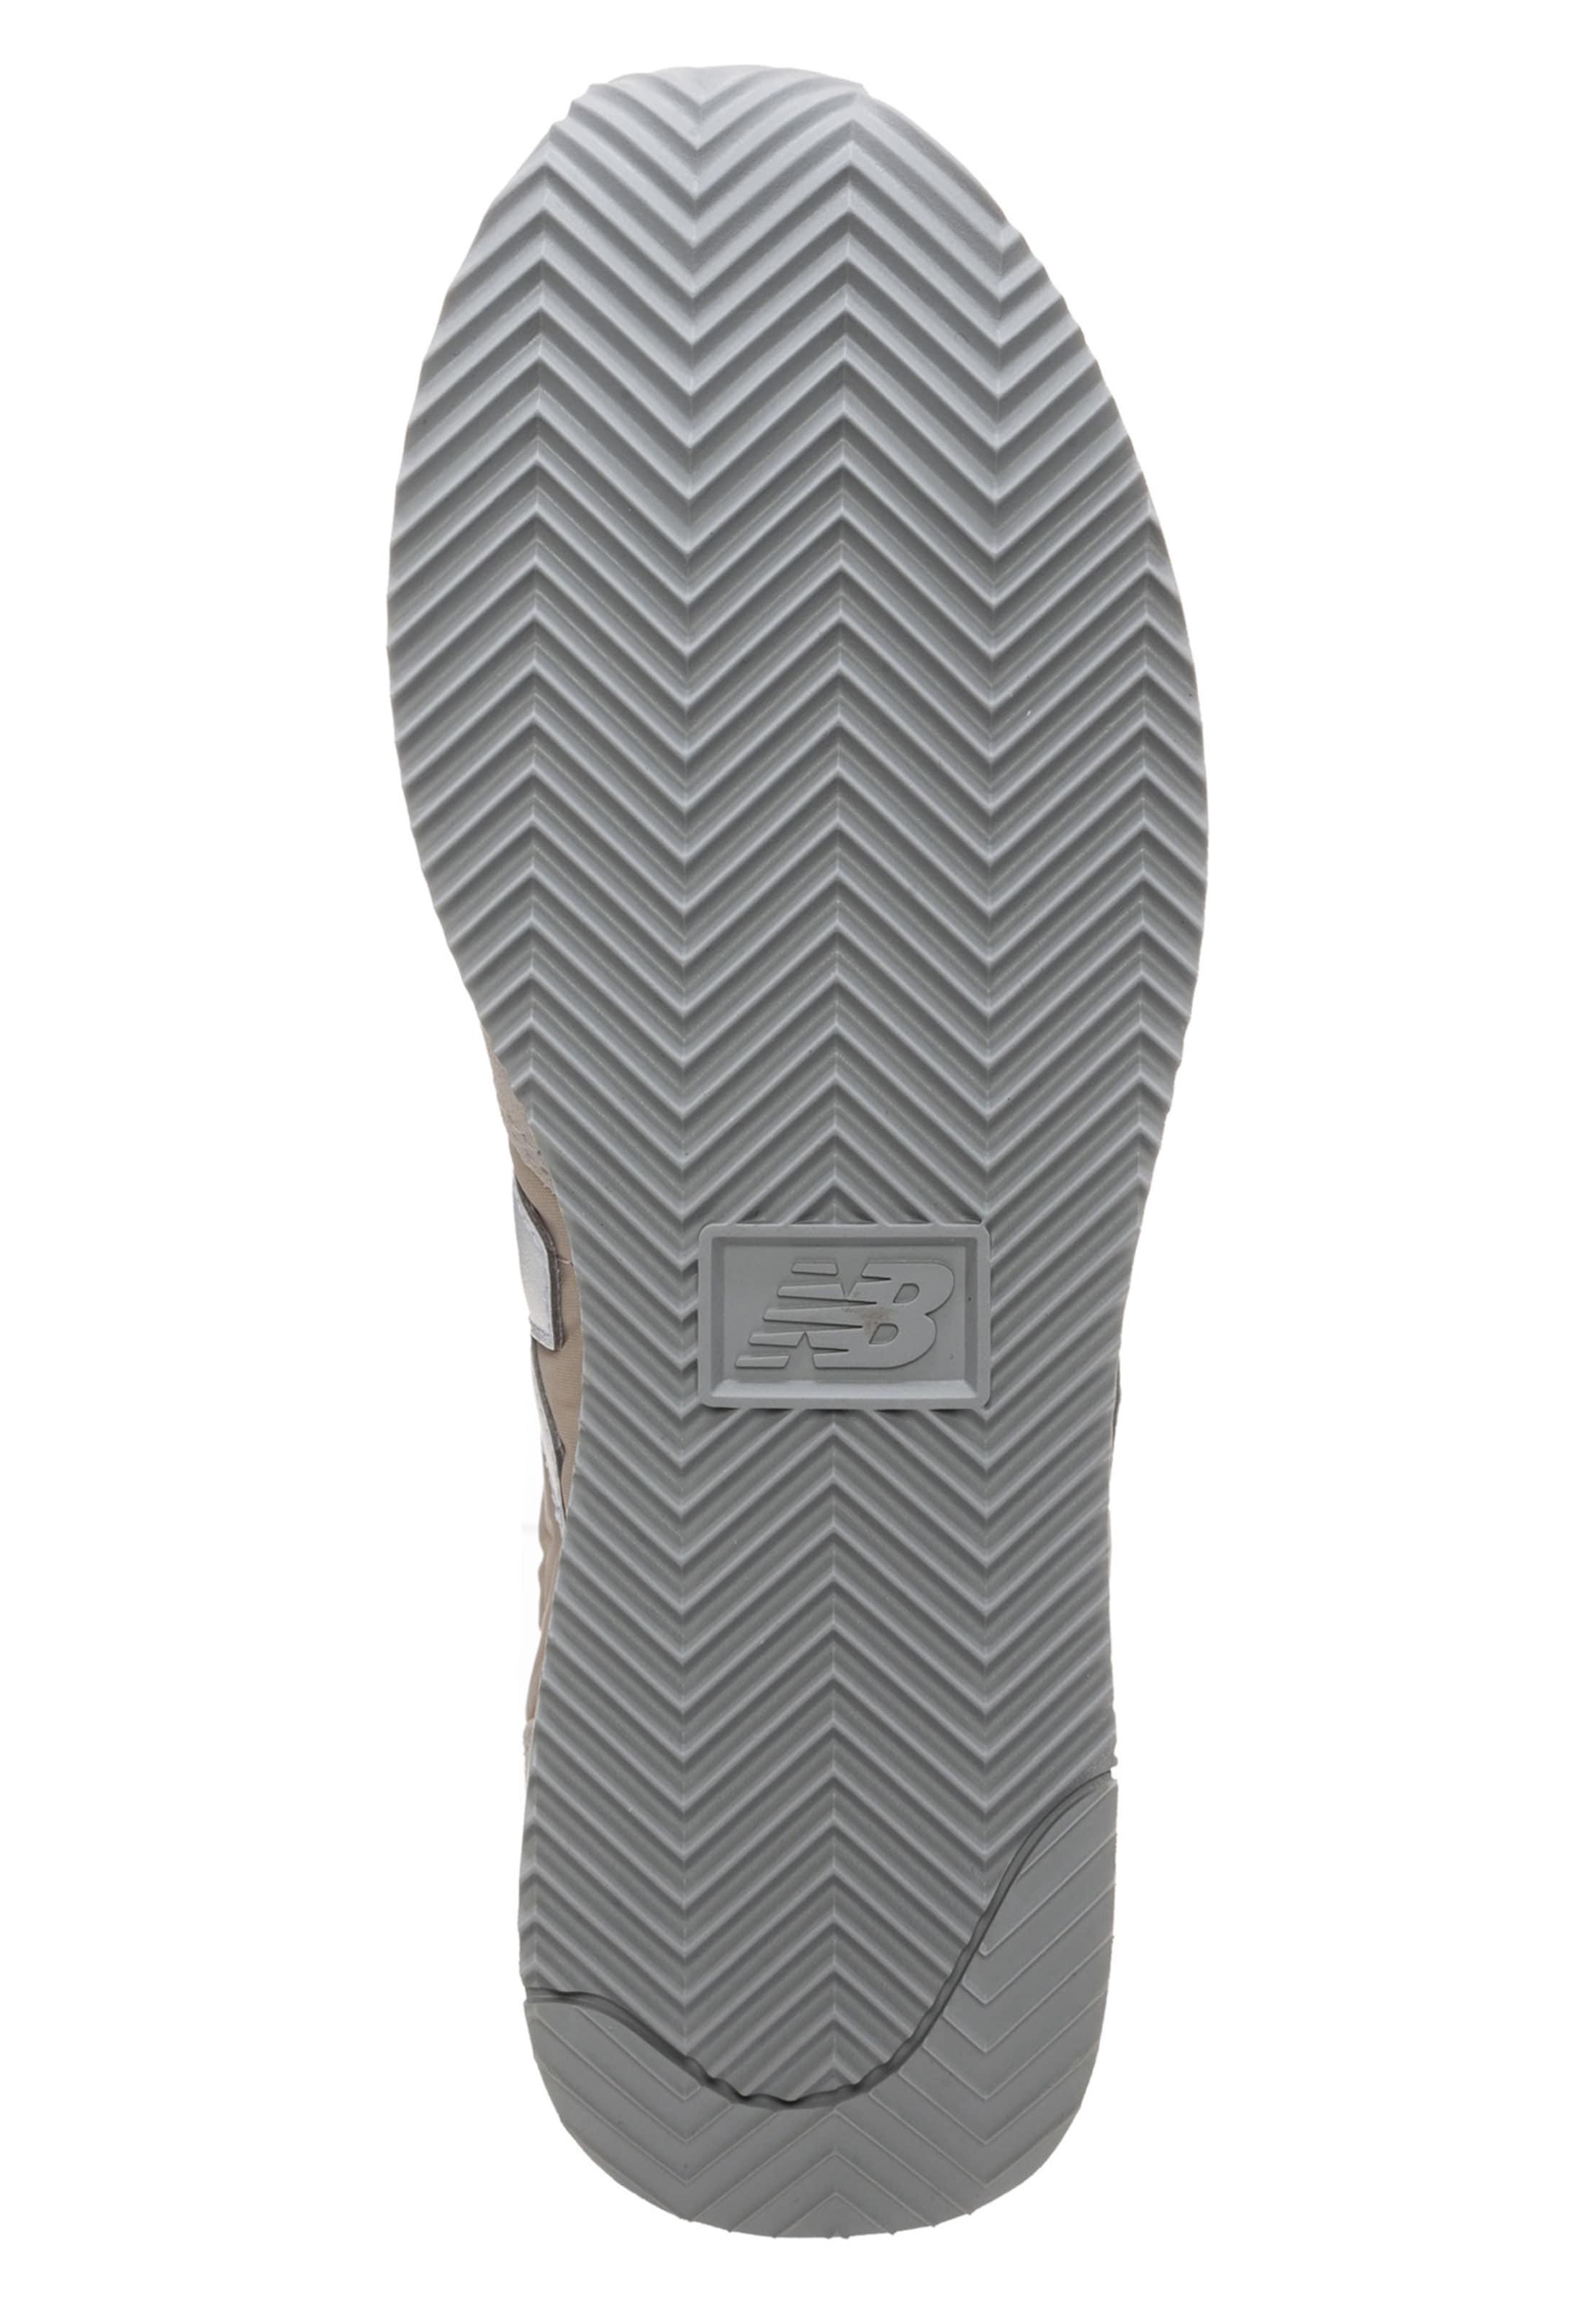 d' New Rosa In dc 'u220 Balance Sneaker ZNnkP80wOX